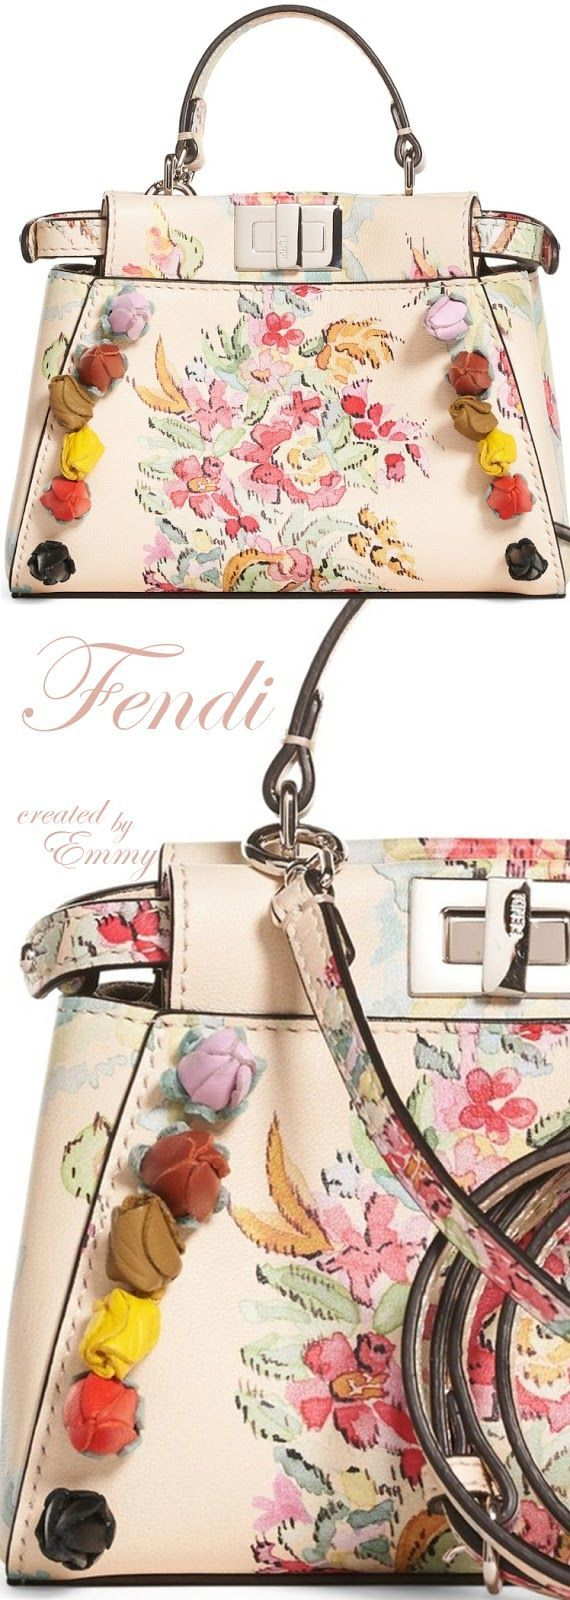 Brilliant Luxury♦Fendi Candy Colours Spring 2017♦Micro Peekaboo Floral Appliqué Leather Satchel